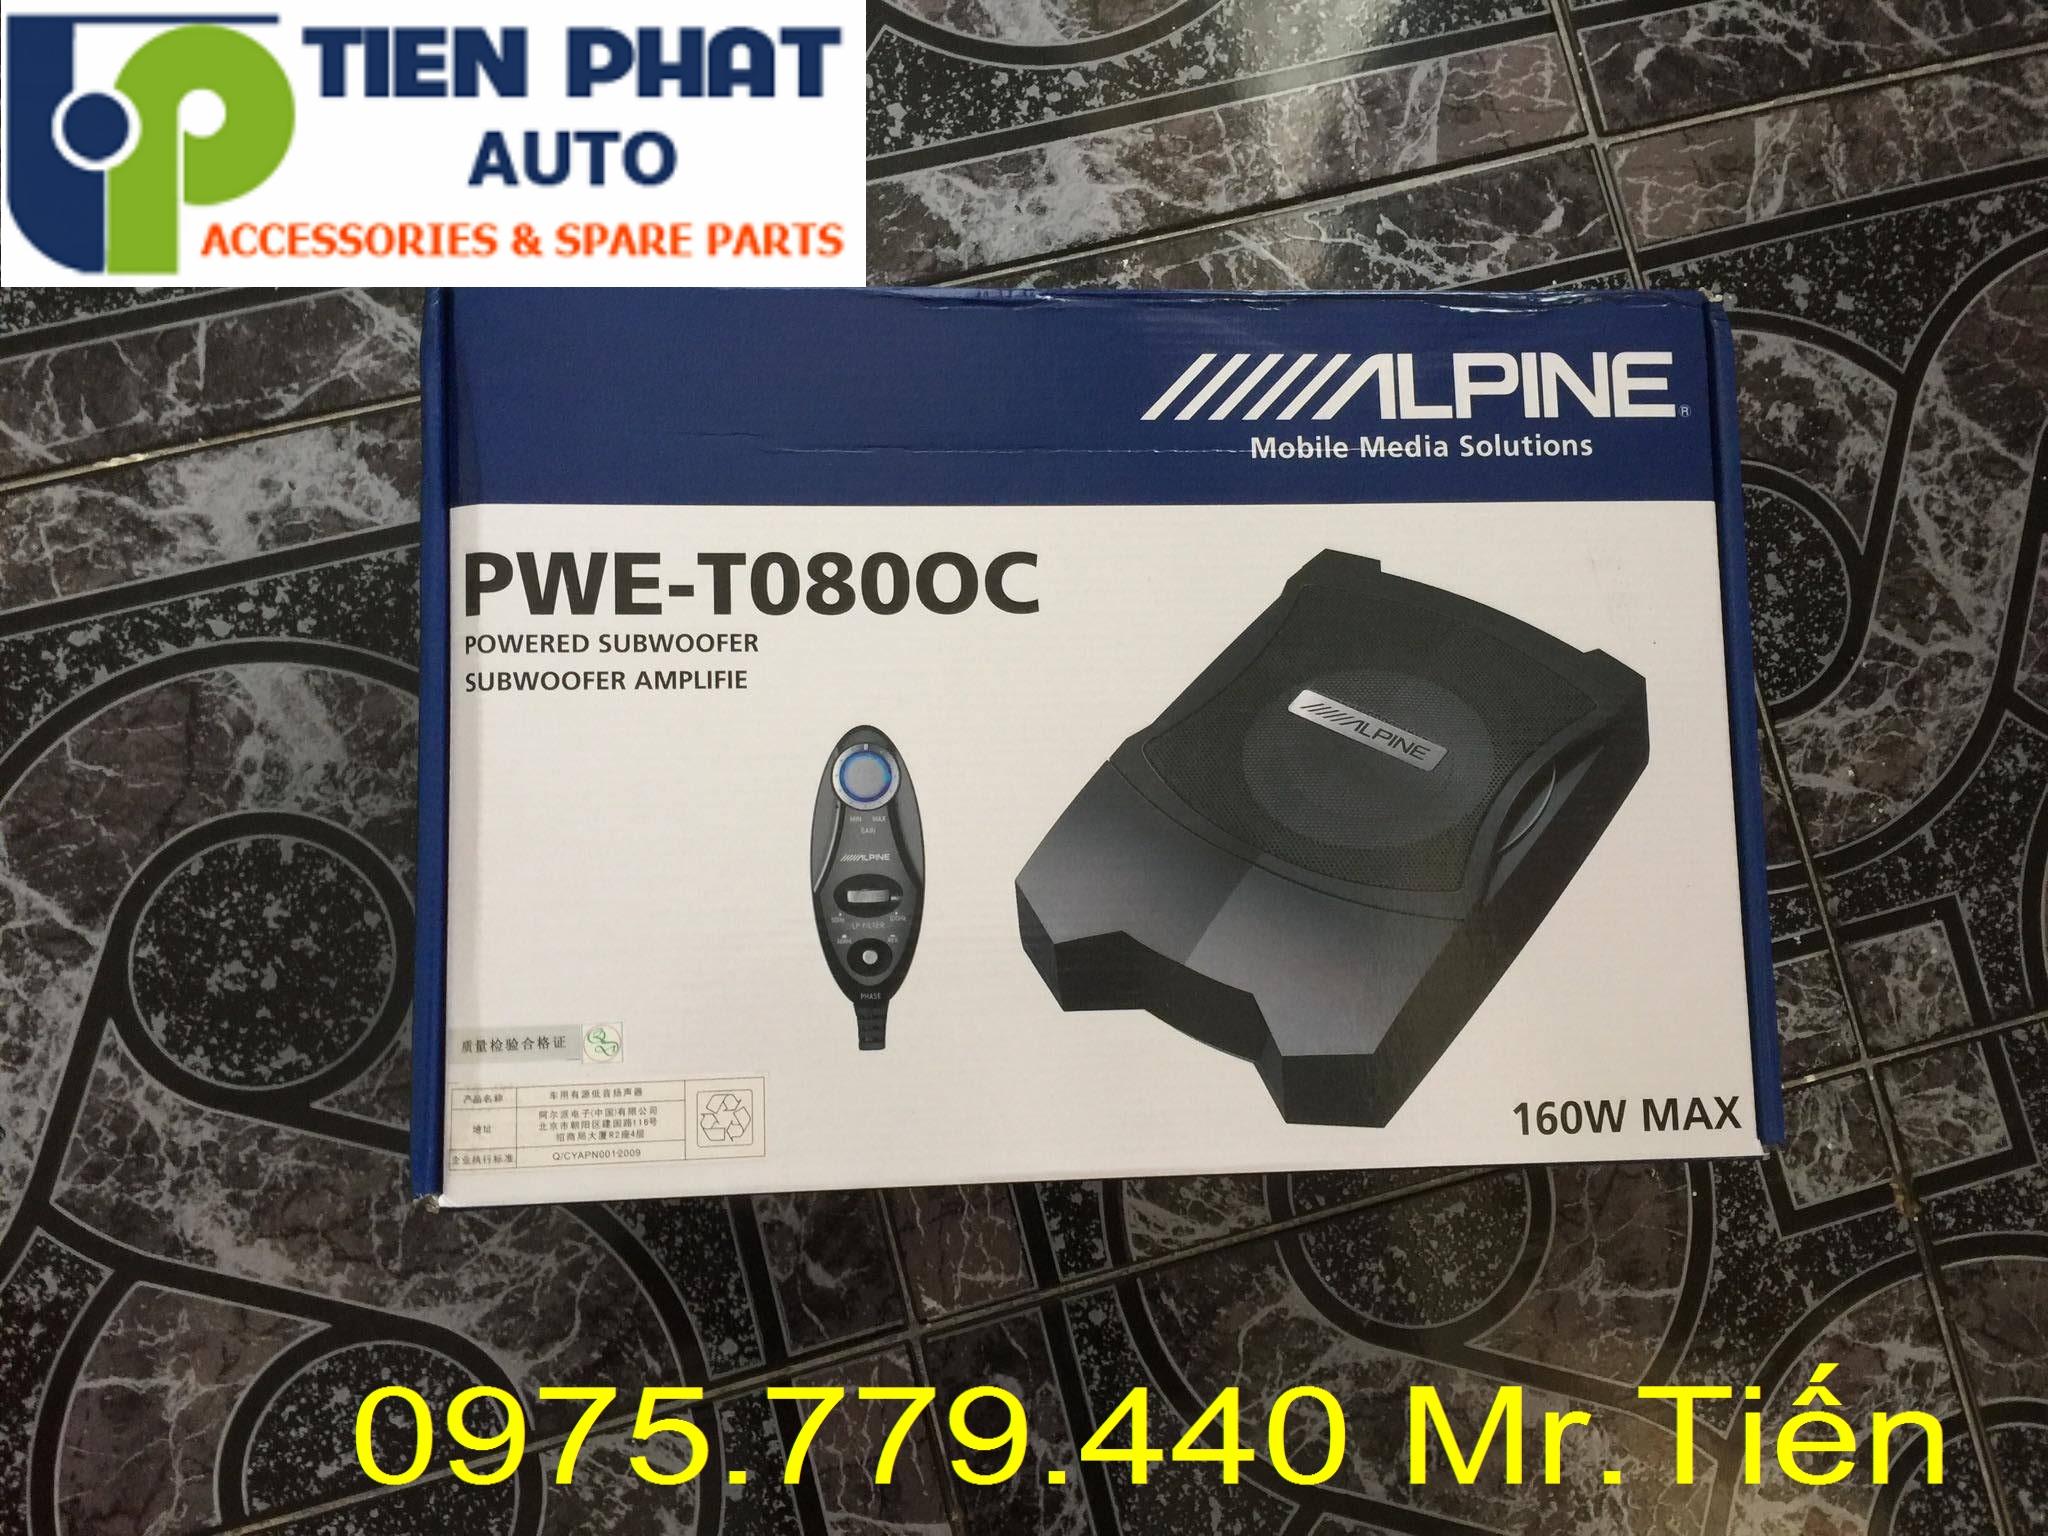 Lắp Loa sub Alpine PWE-T0800C cho Kia Careto Lắp Đặt Tận Nơi